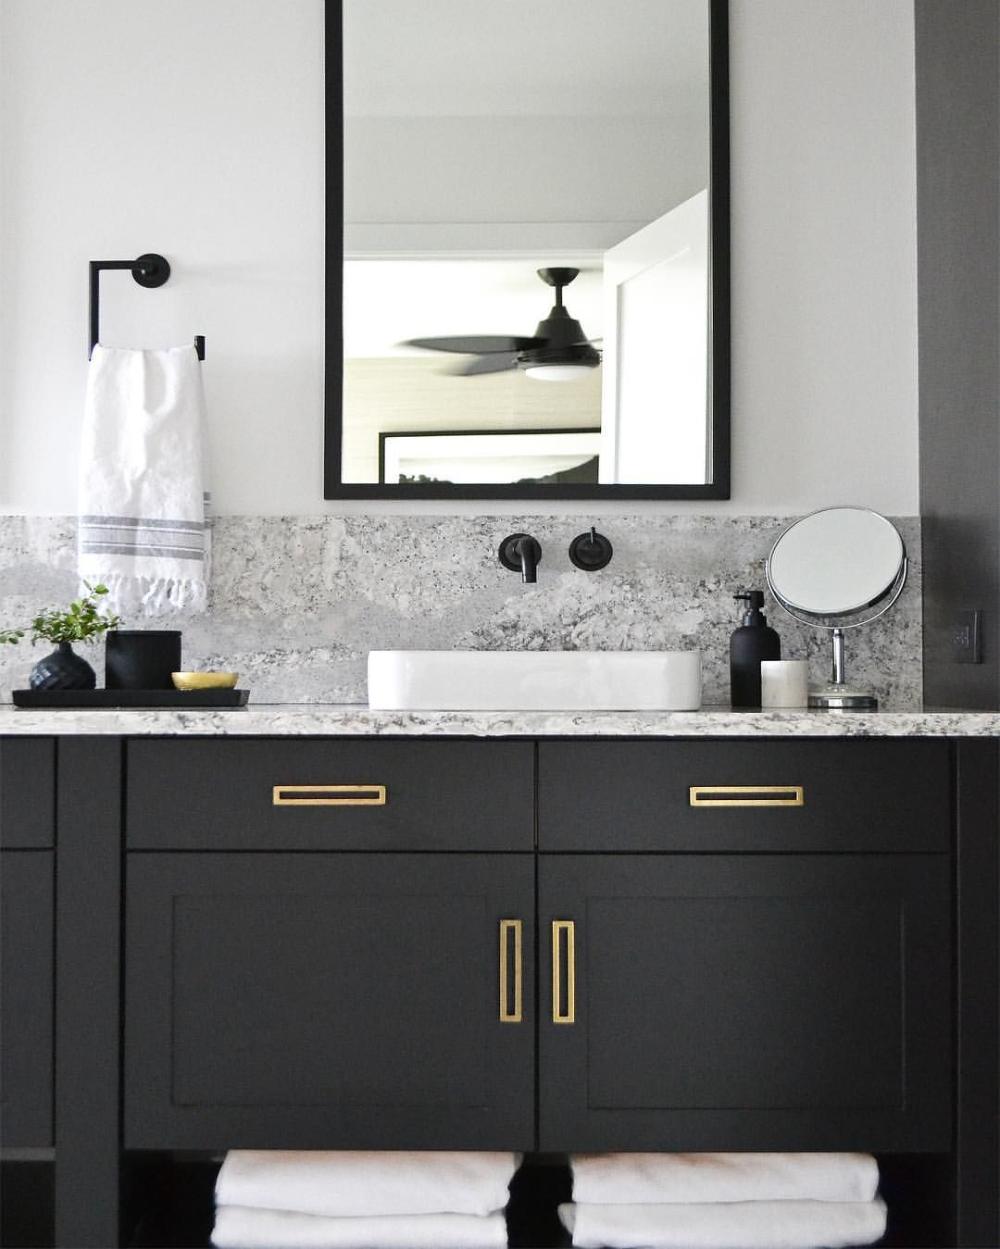 Black Cabinets Brass Hardware Black Tray And Accessories Black Vanity Bathroom B Bathroom Vanity Designs Beautiful Bathroom Vanity Black Cabinets Bathroom